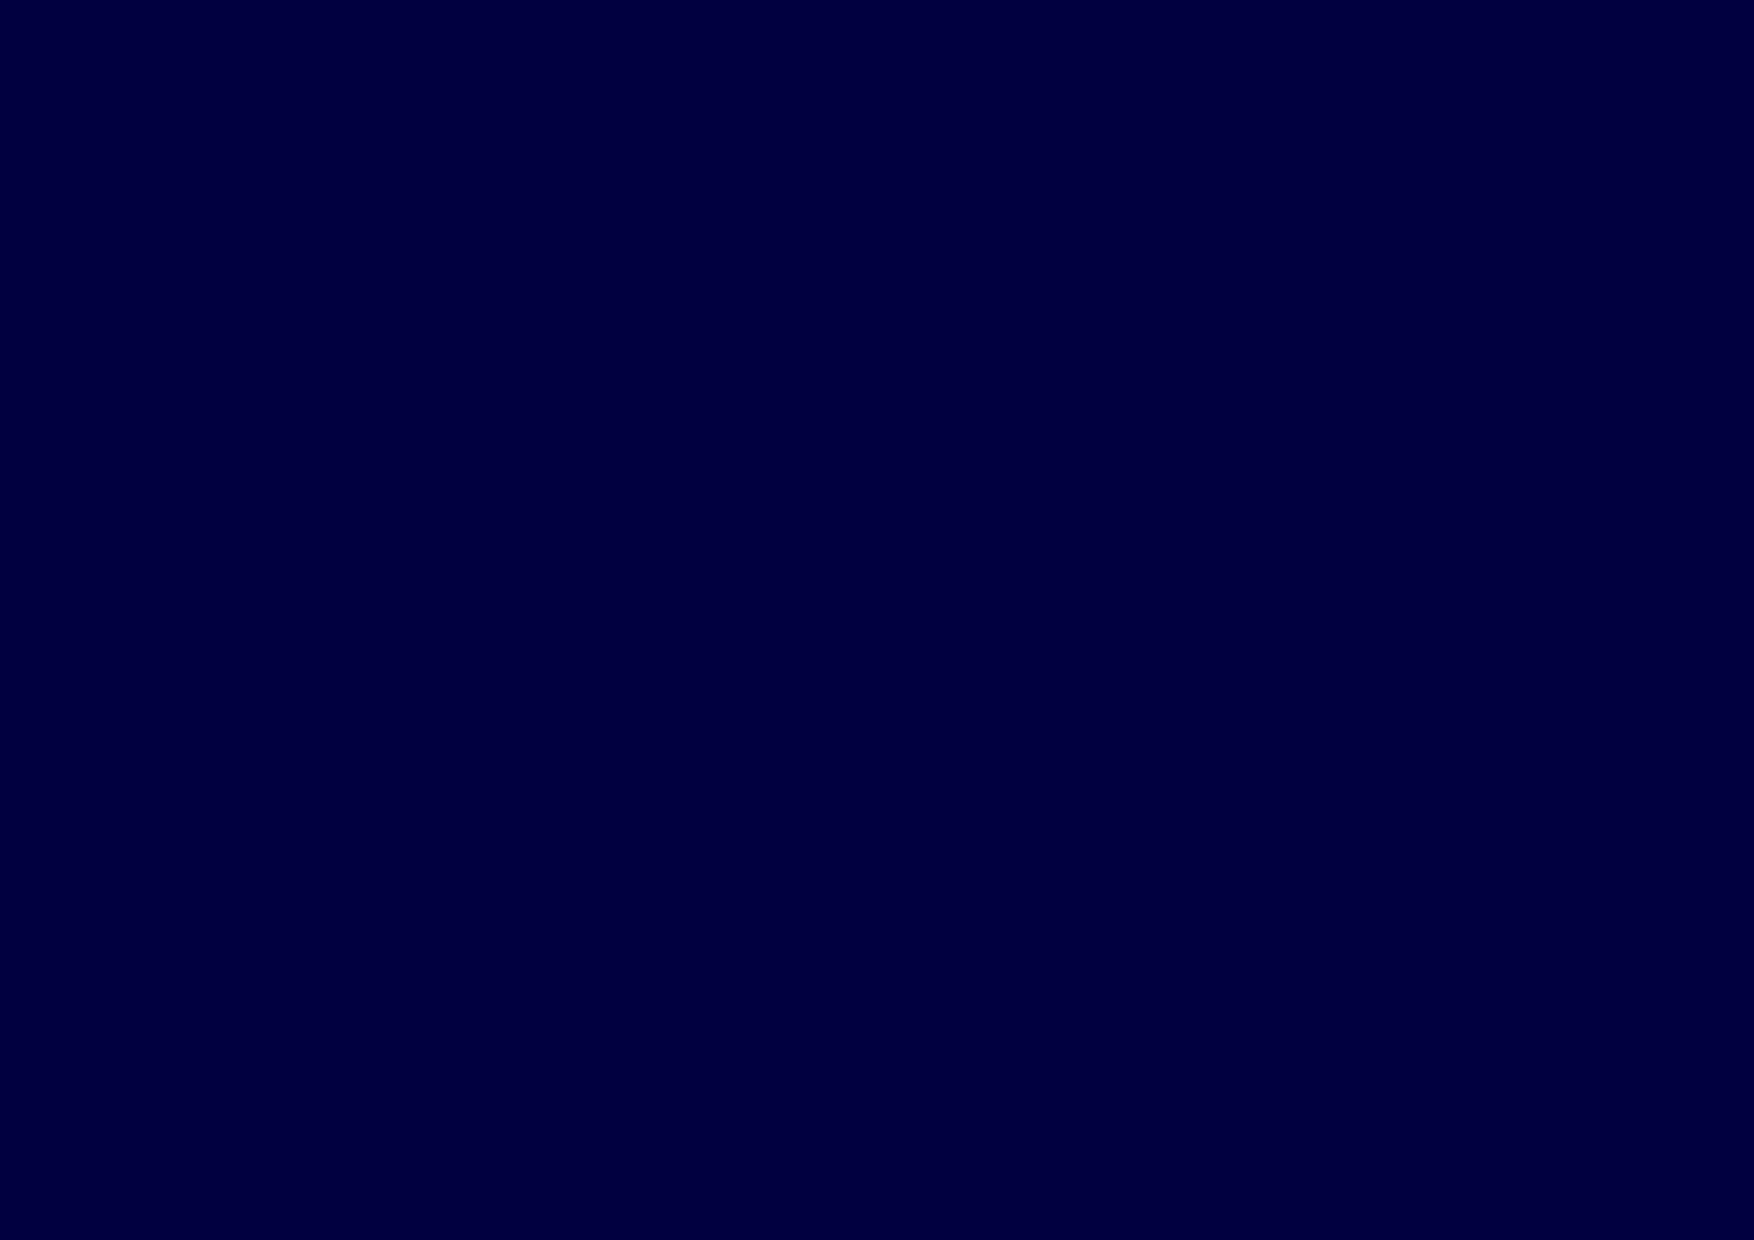 Dark Blue Wallpaper Related Keywords amp Suggestions   Dark 1754x1240